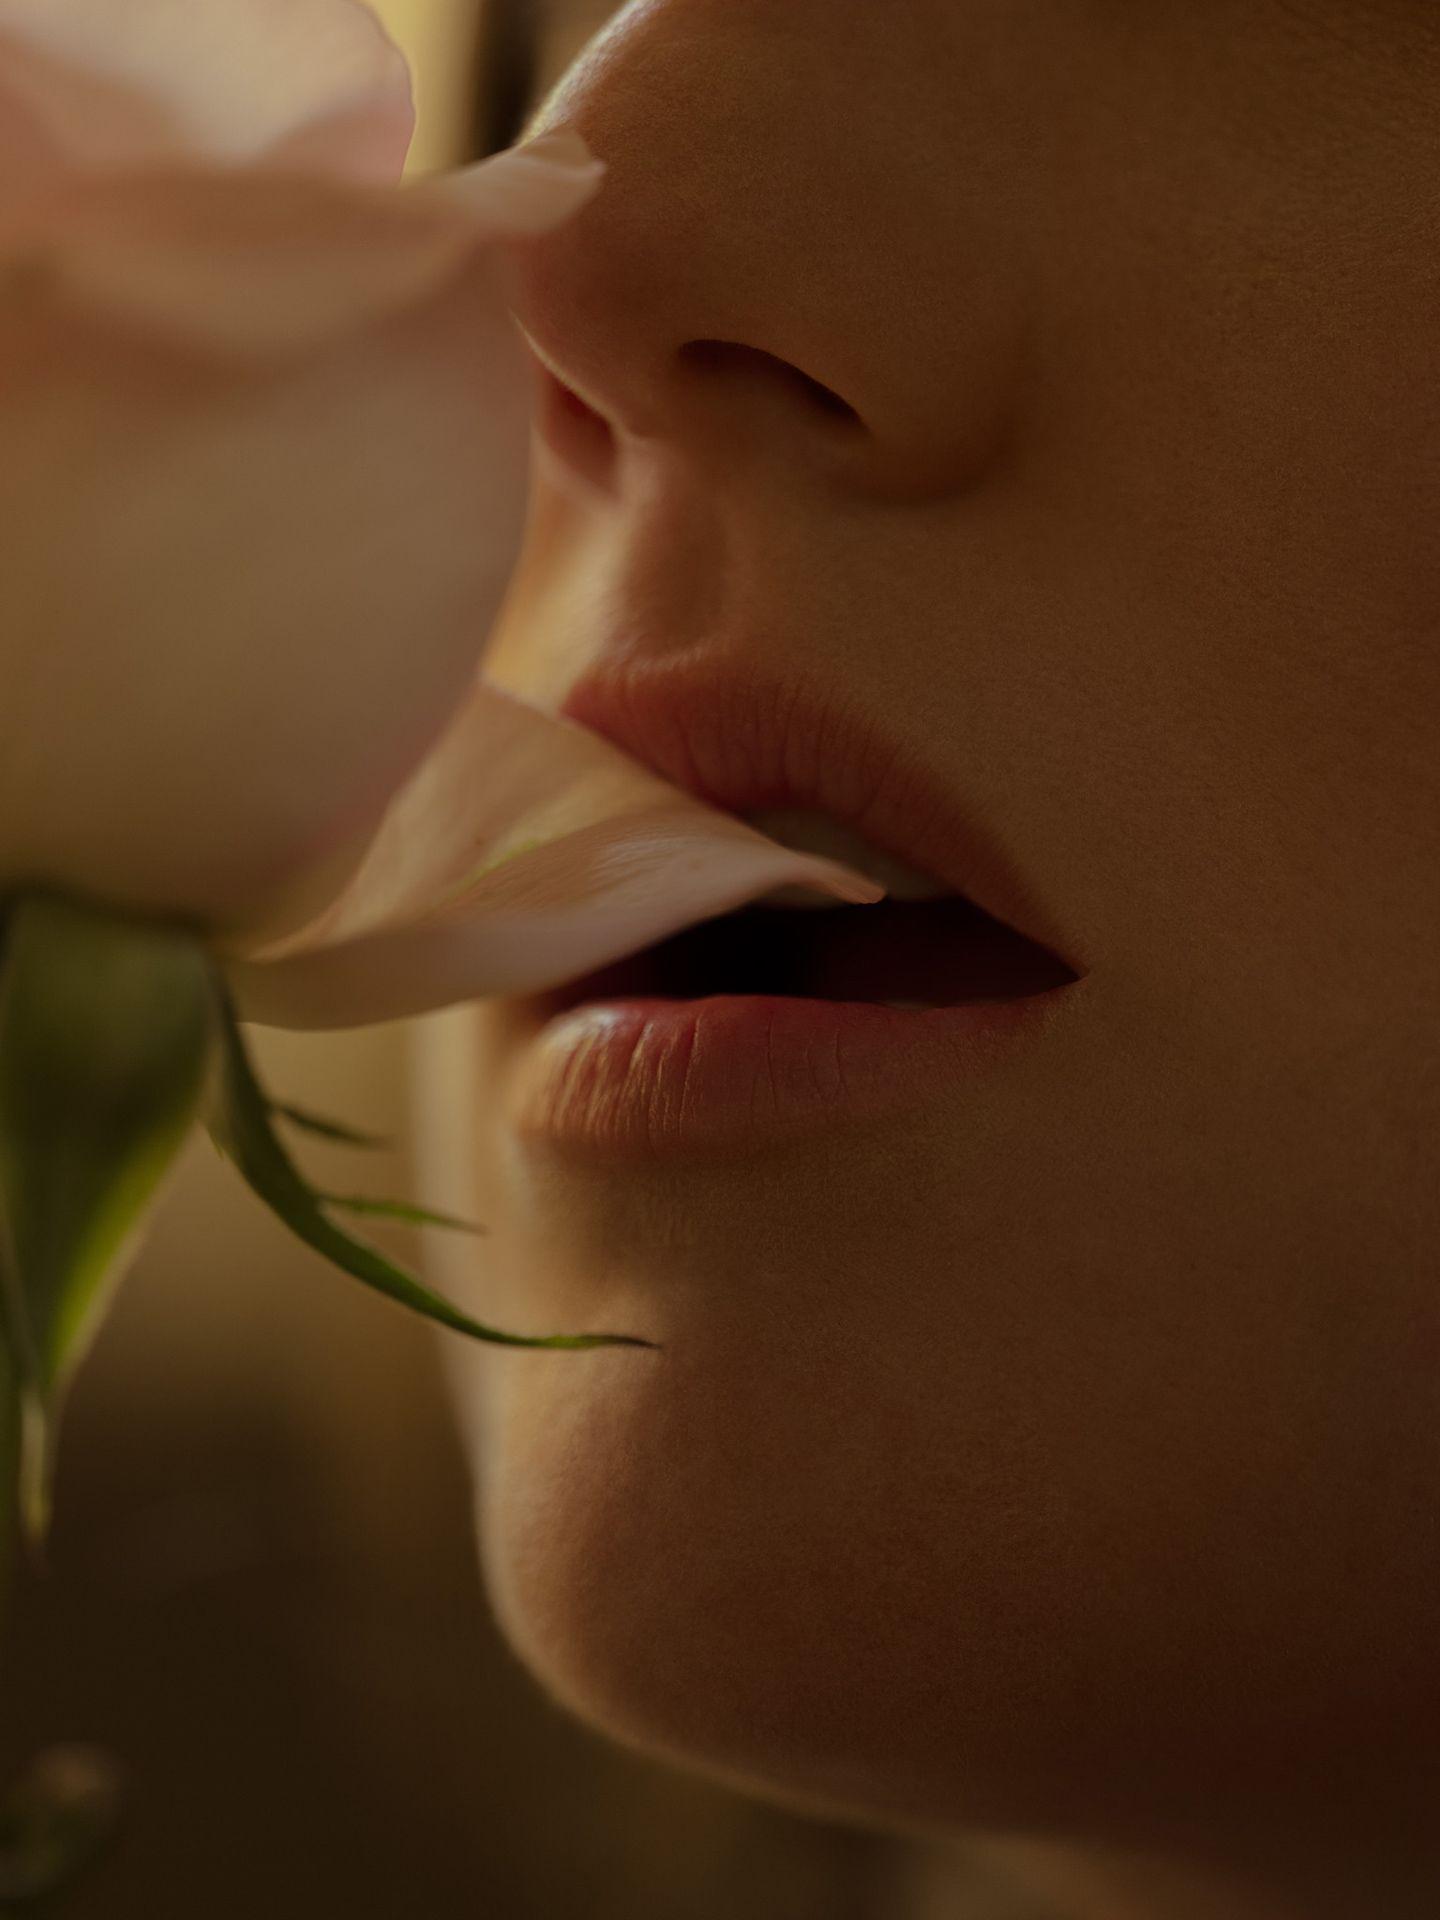 zoomed in portrait of singer Fanny Bloom rose petal between her lips for her album Liqueur by Maxyme G. Delisle